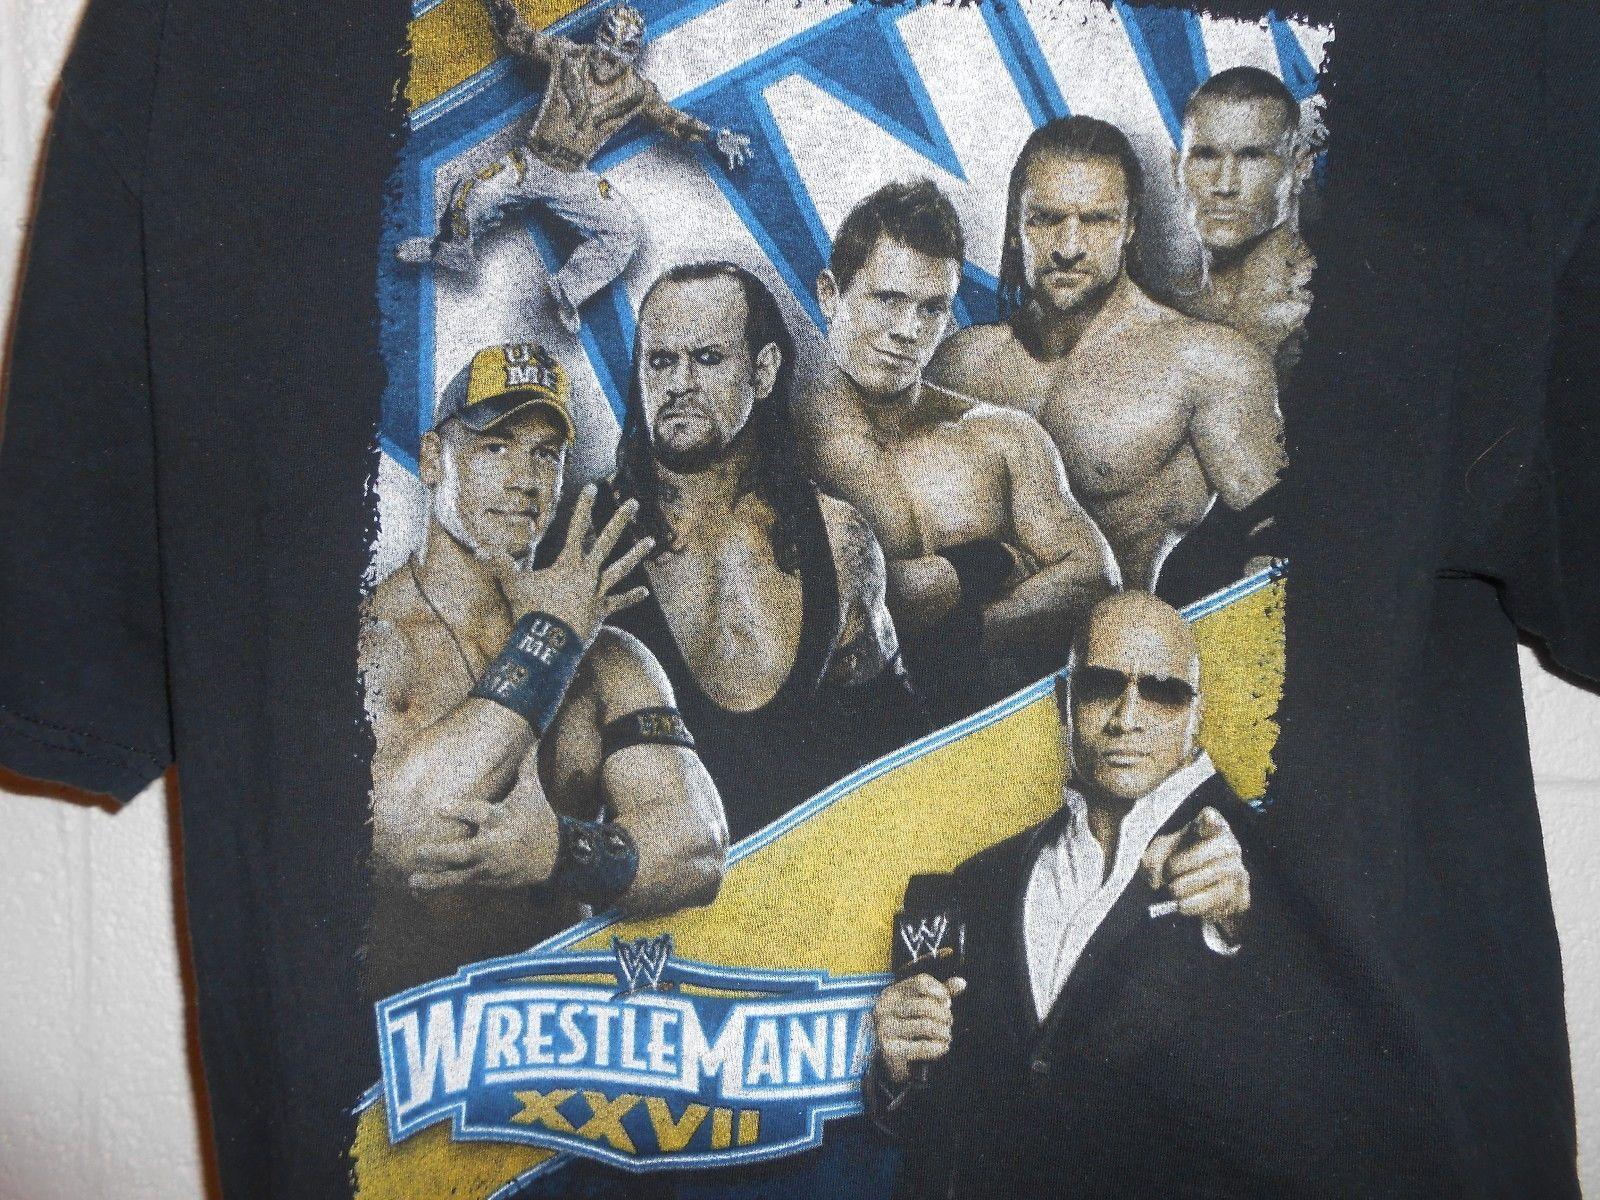 Wrestlemania XXVII 2011 WWF WWE 2 Sided T Shirt The Undertaker The Rock Sz L